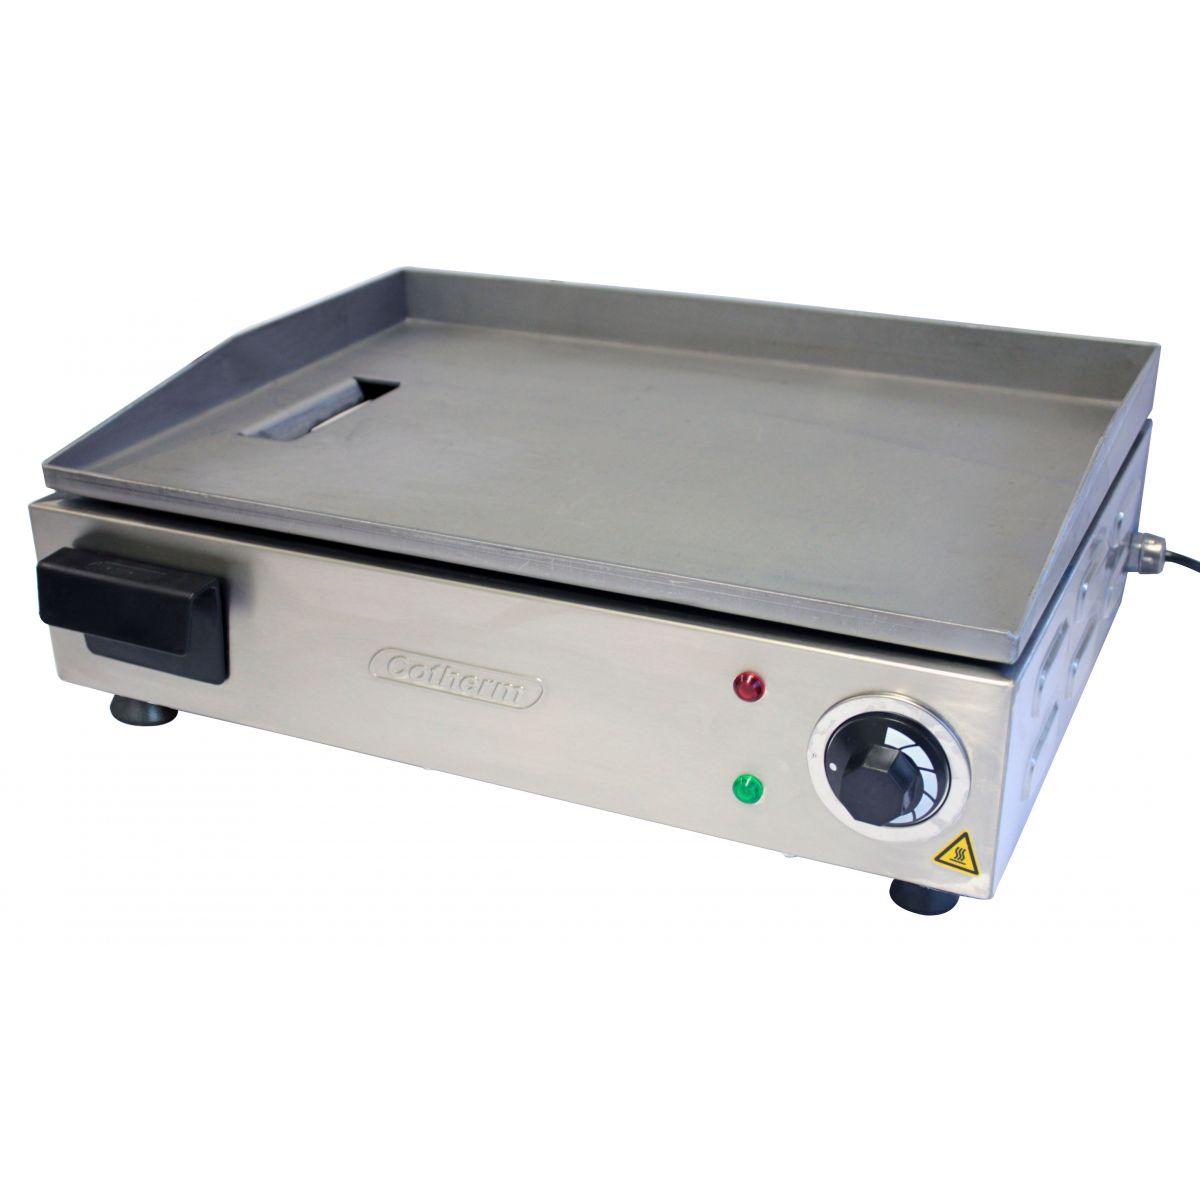 Chapeira para Lanches elétrica Profissional 50x40cm 1600W Cotherm  - Mix Eletro